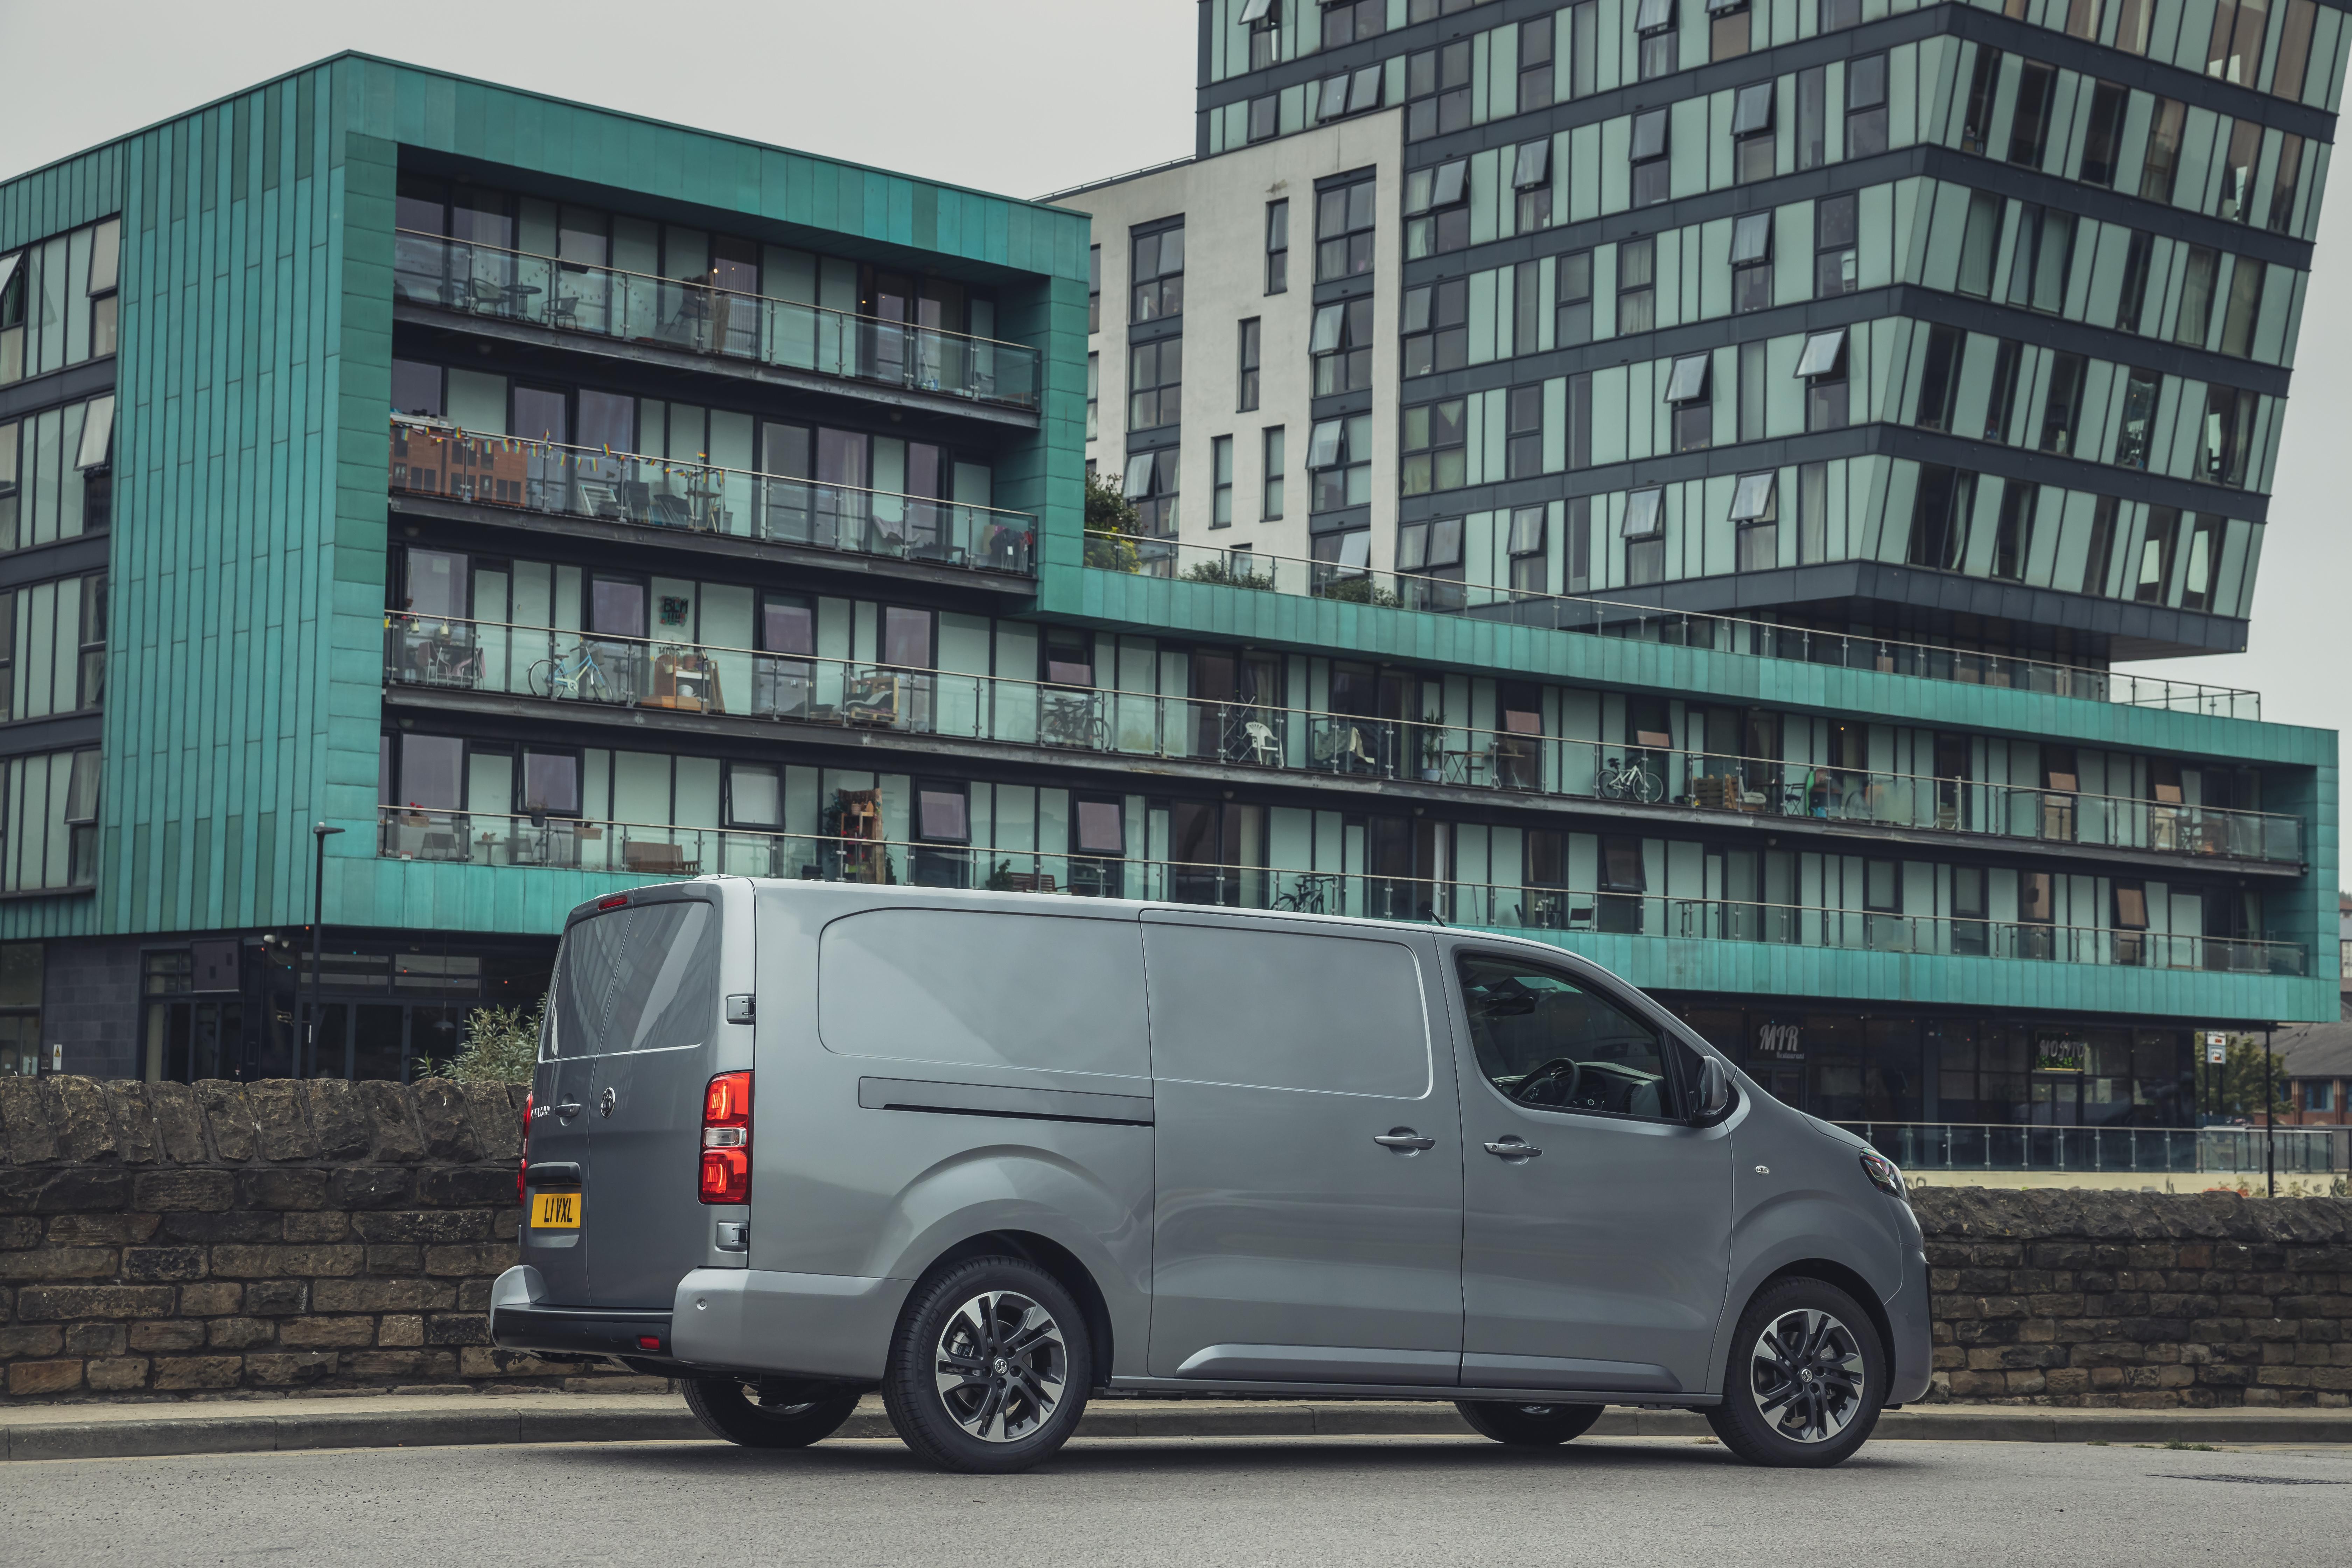 OVO Energy Orders 1,000 Electric Vans For Its UK Fleet